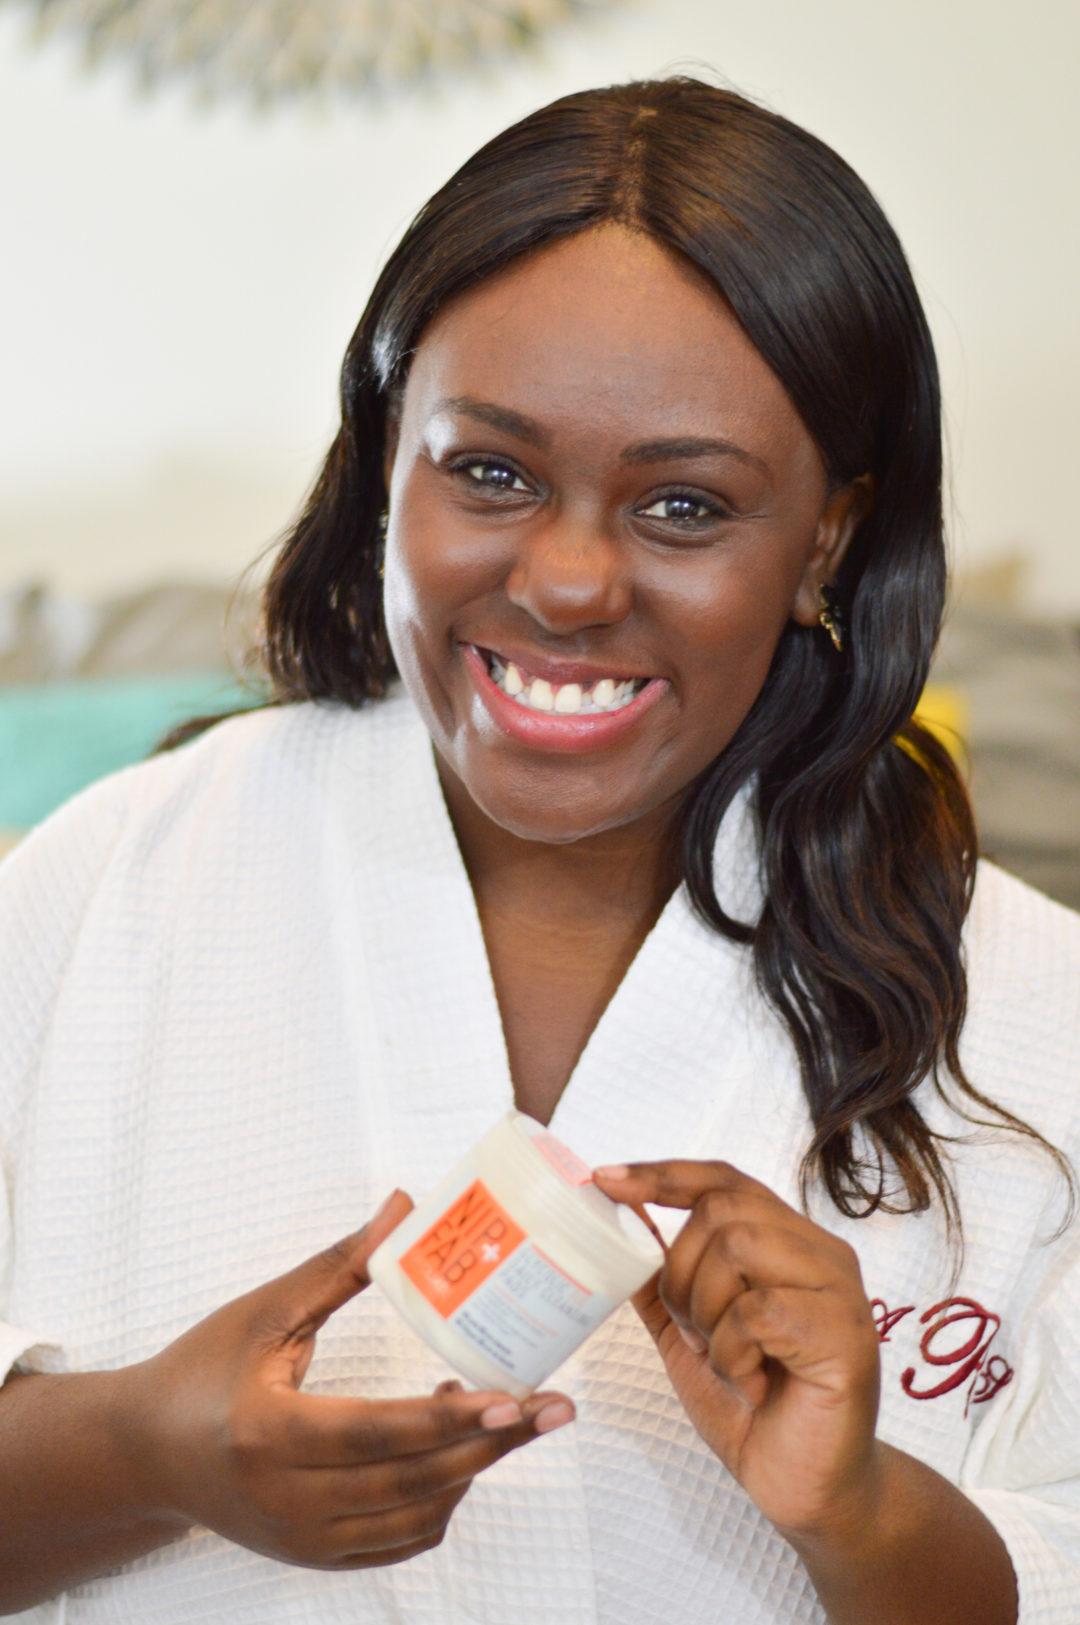 Nip + Fab beauty products | Lots of Sass Blog